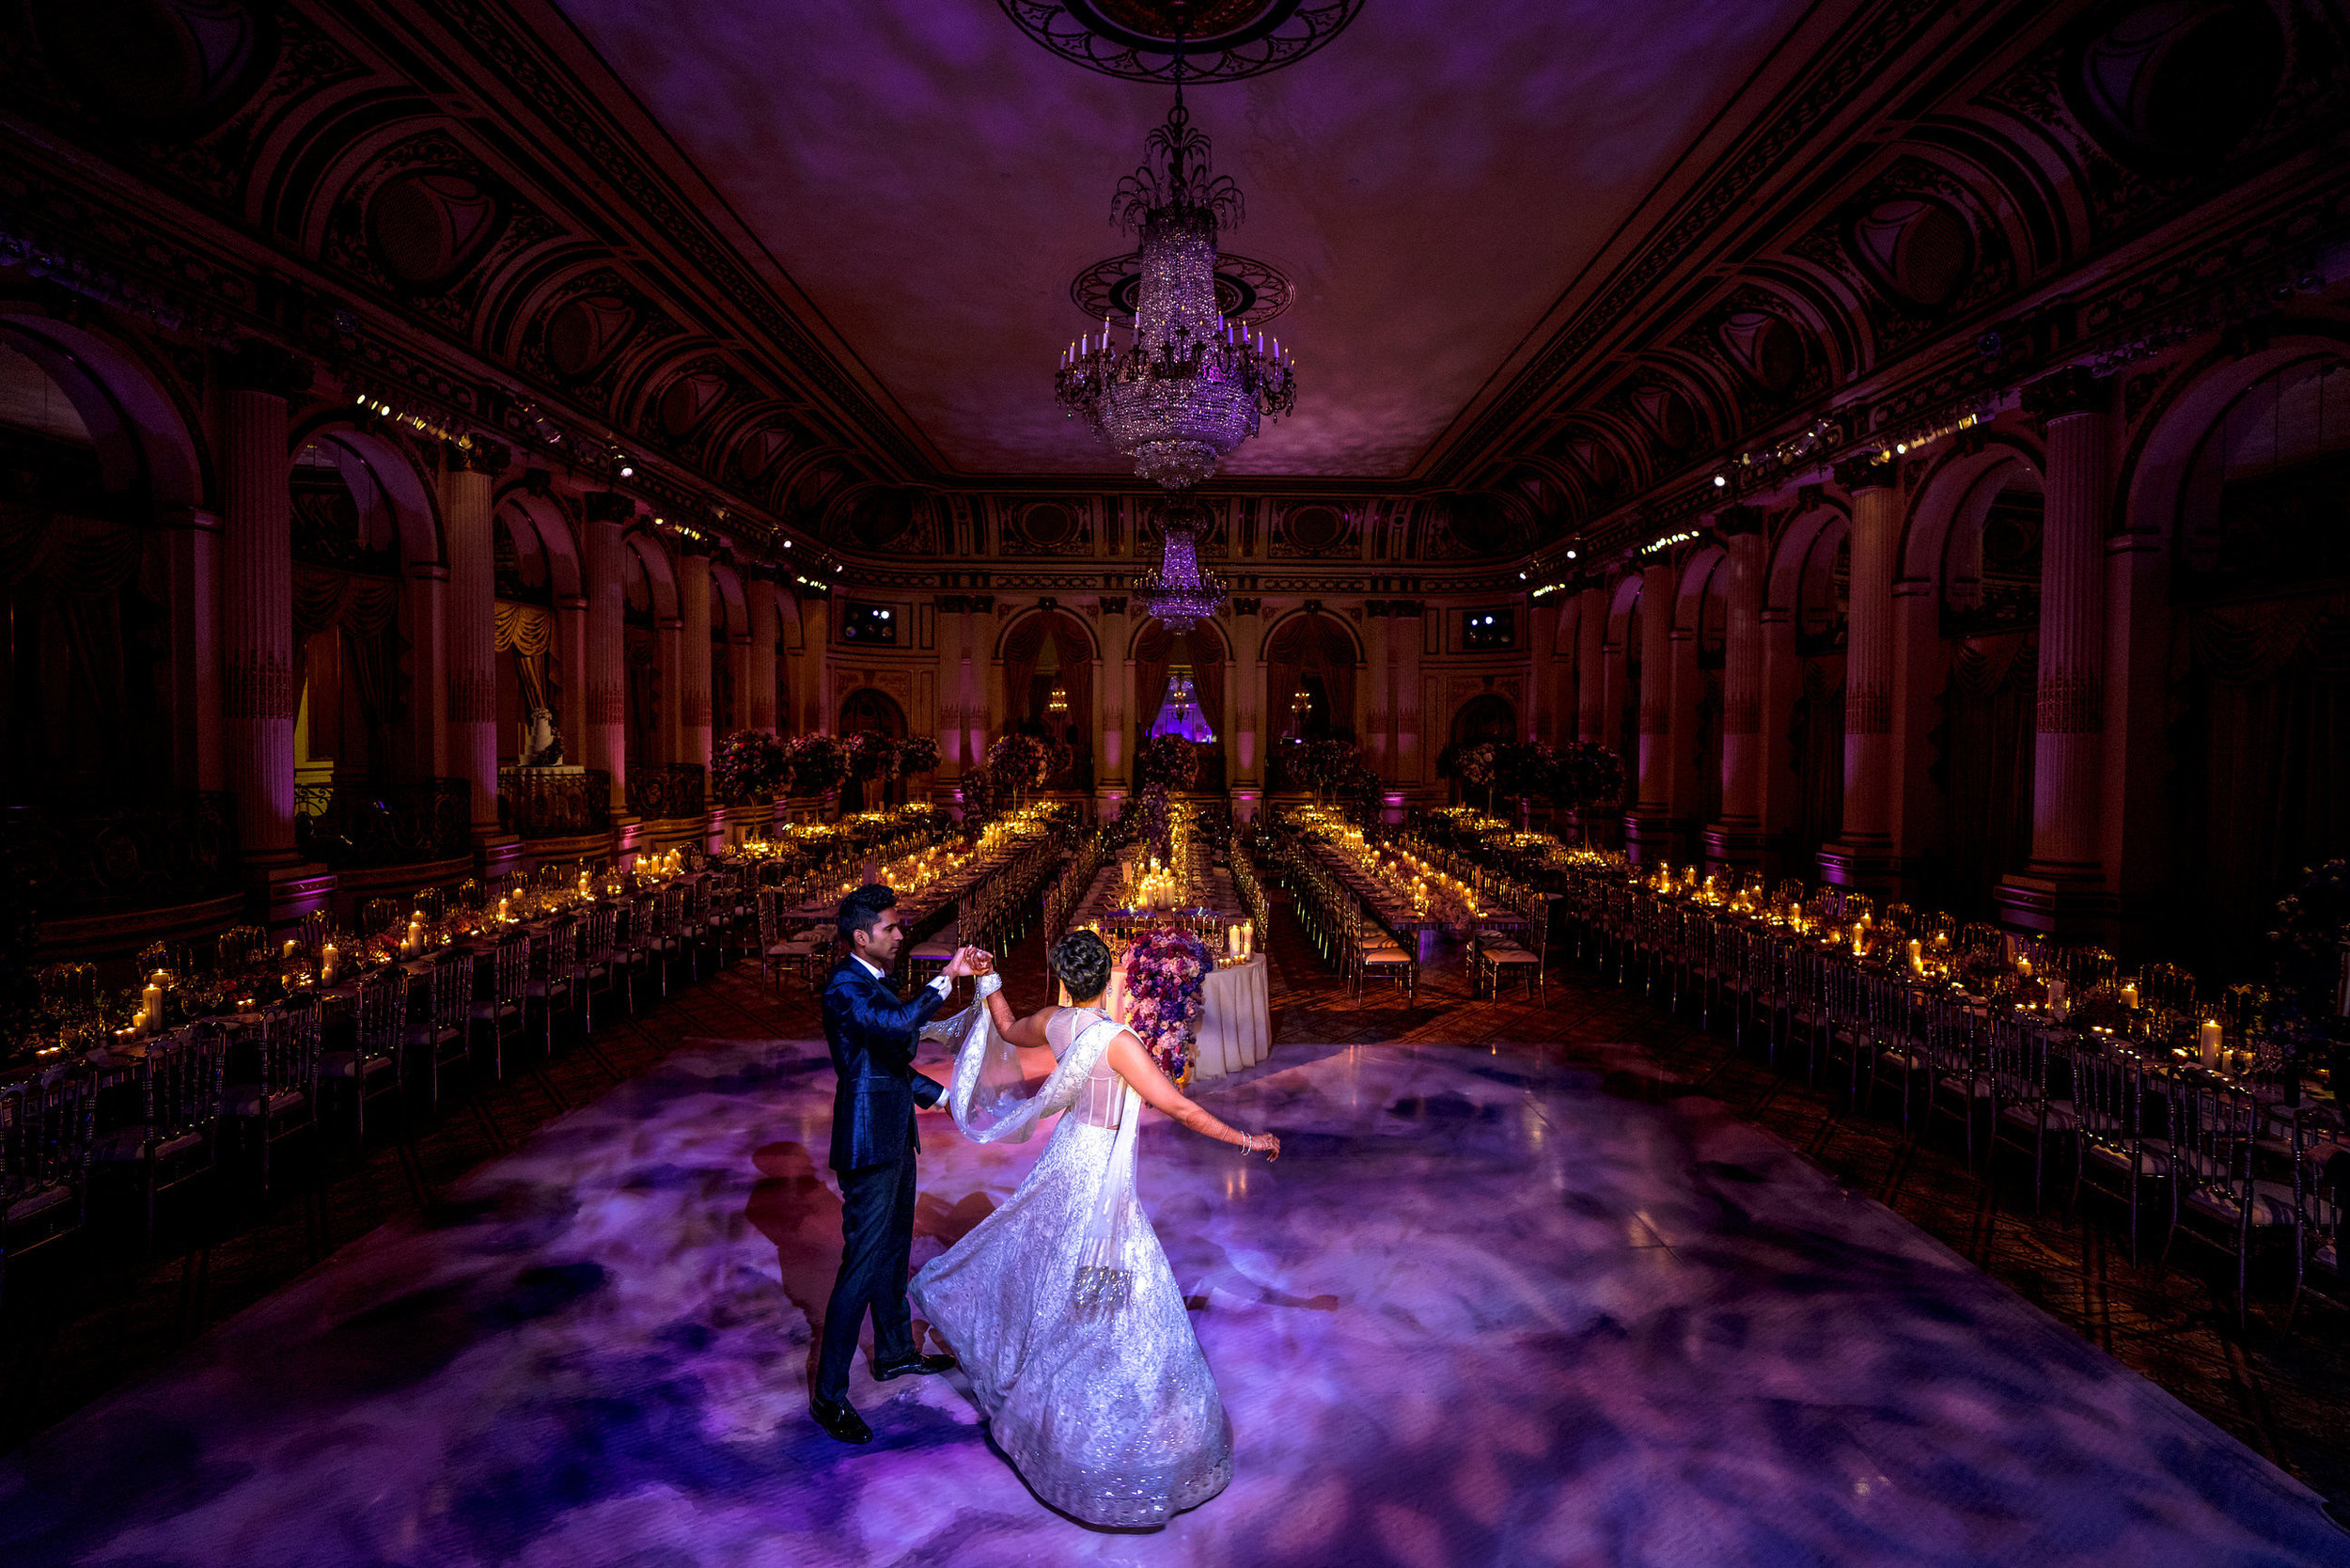 INDIAN WEDDING BRIDE AND GROOM DANCING SHOT2.JPG